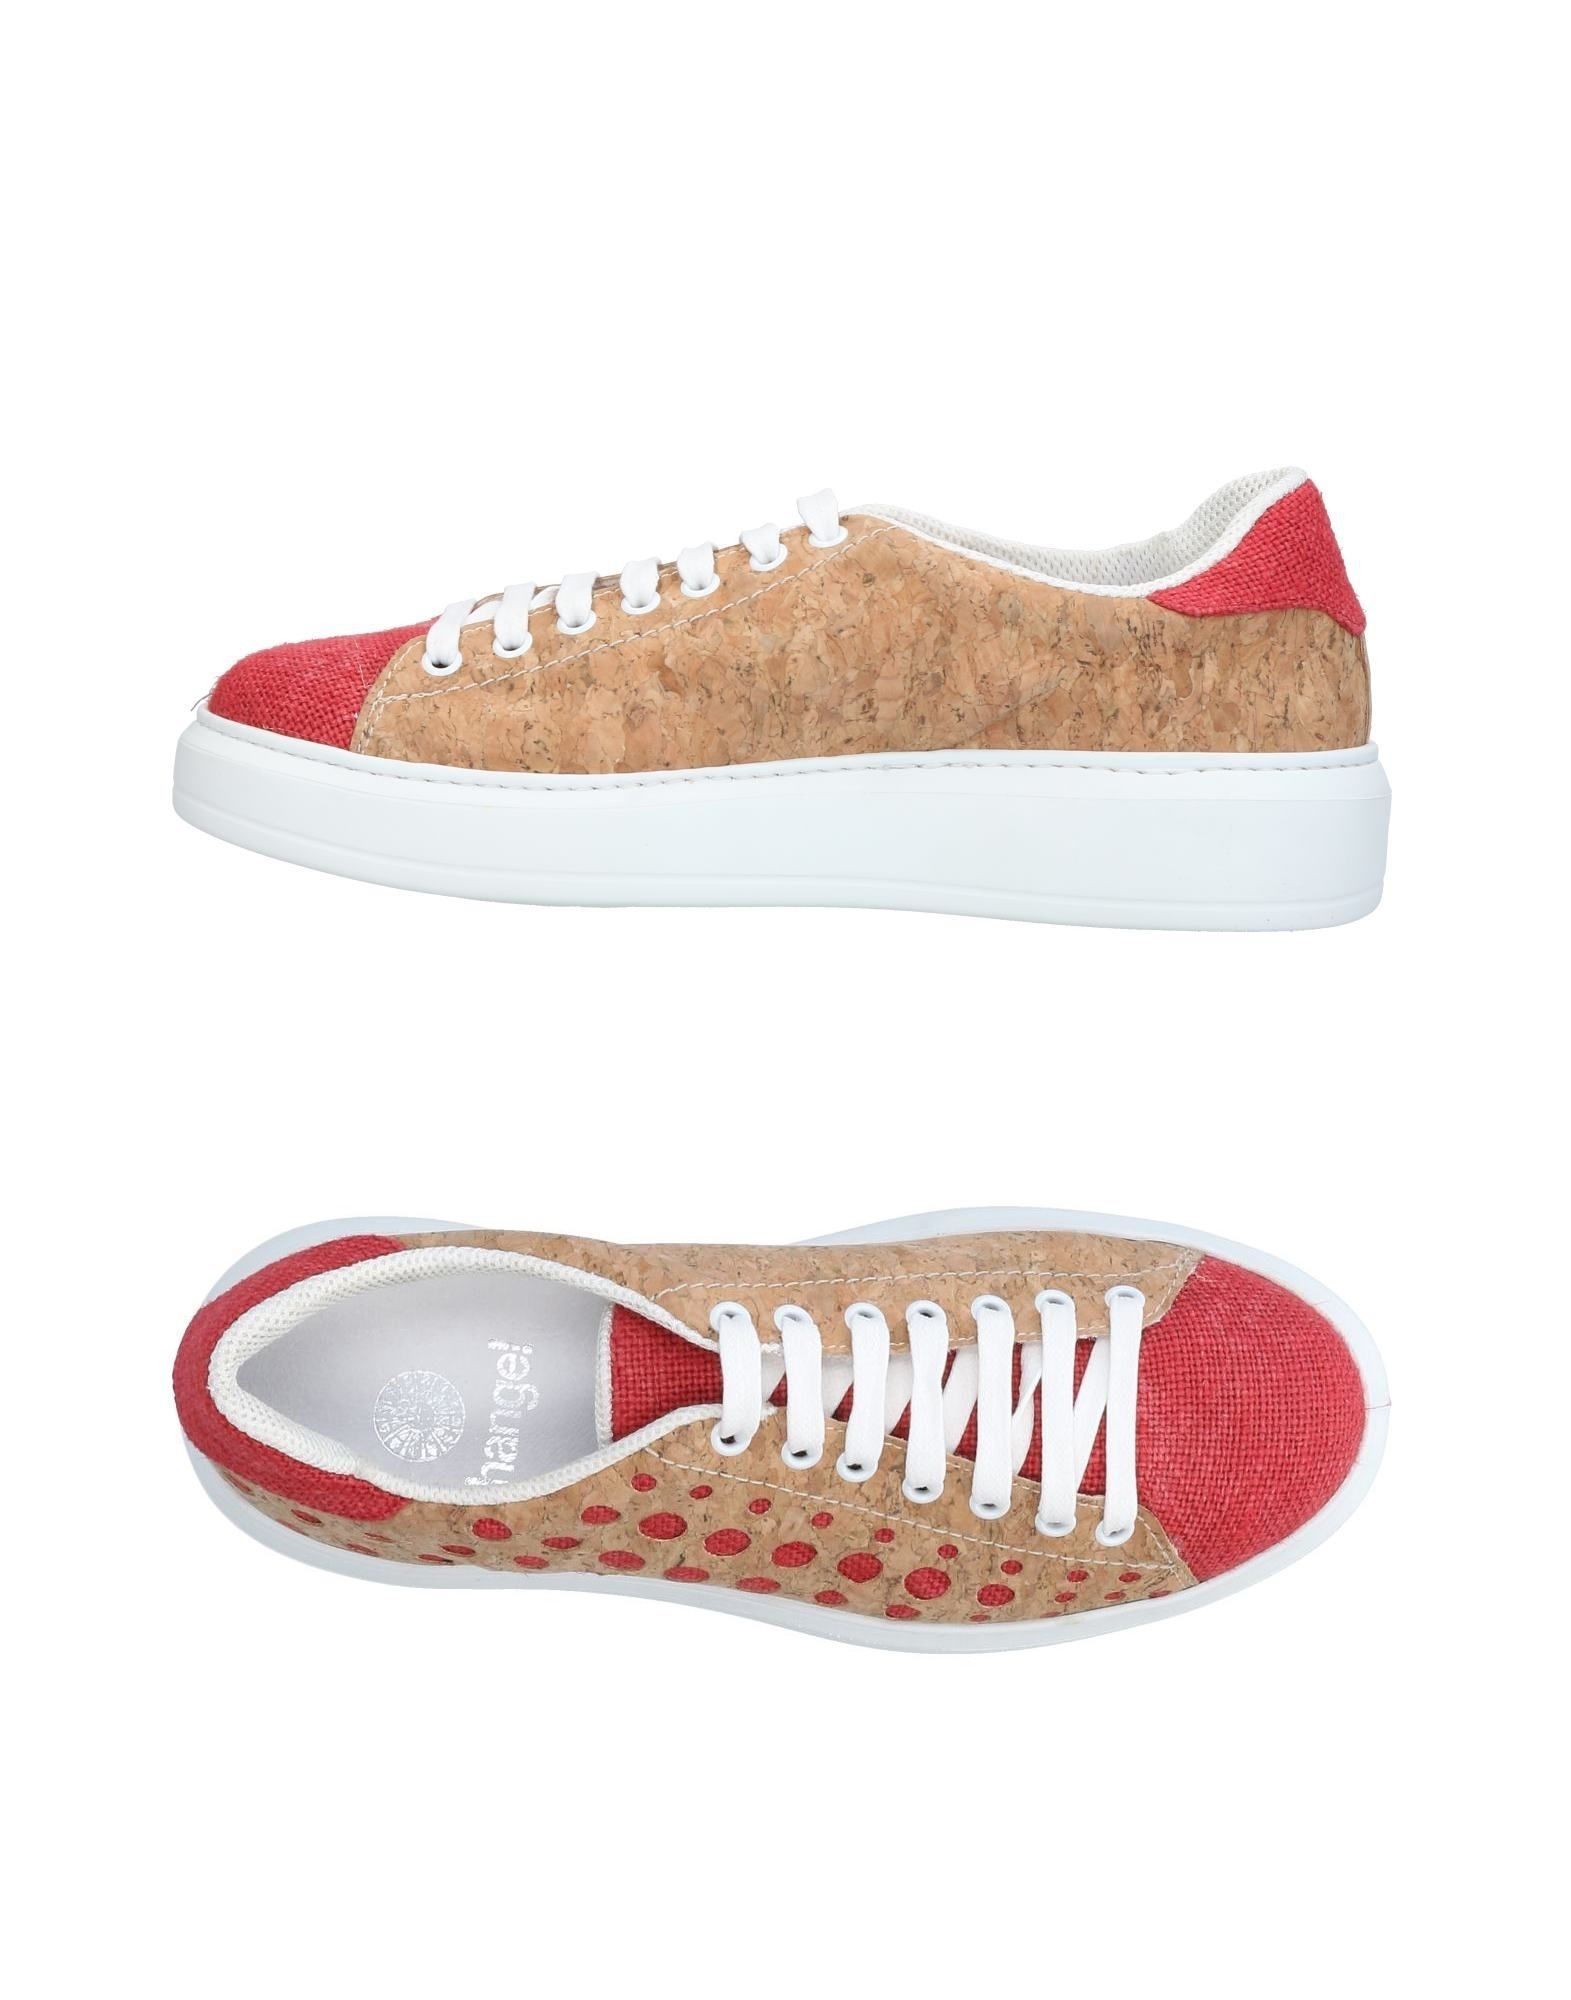 Moda Sneakers Change Donna Donna Change - 11460386KL 3bd06c